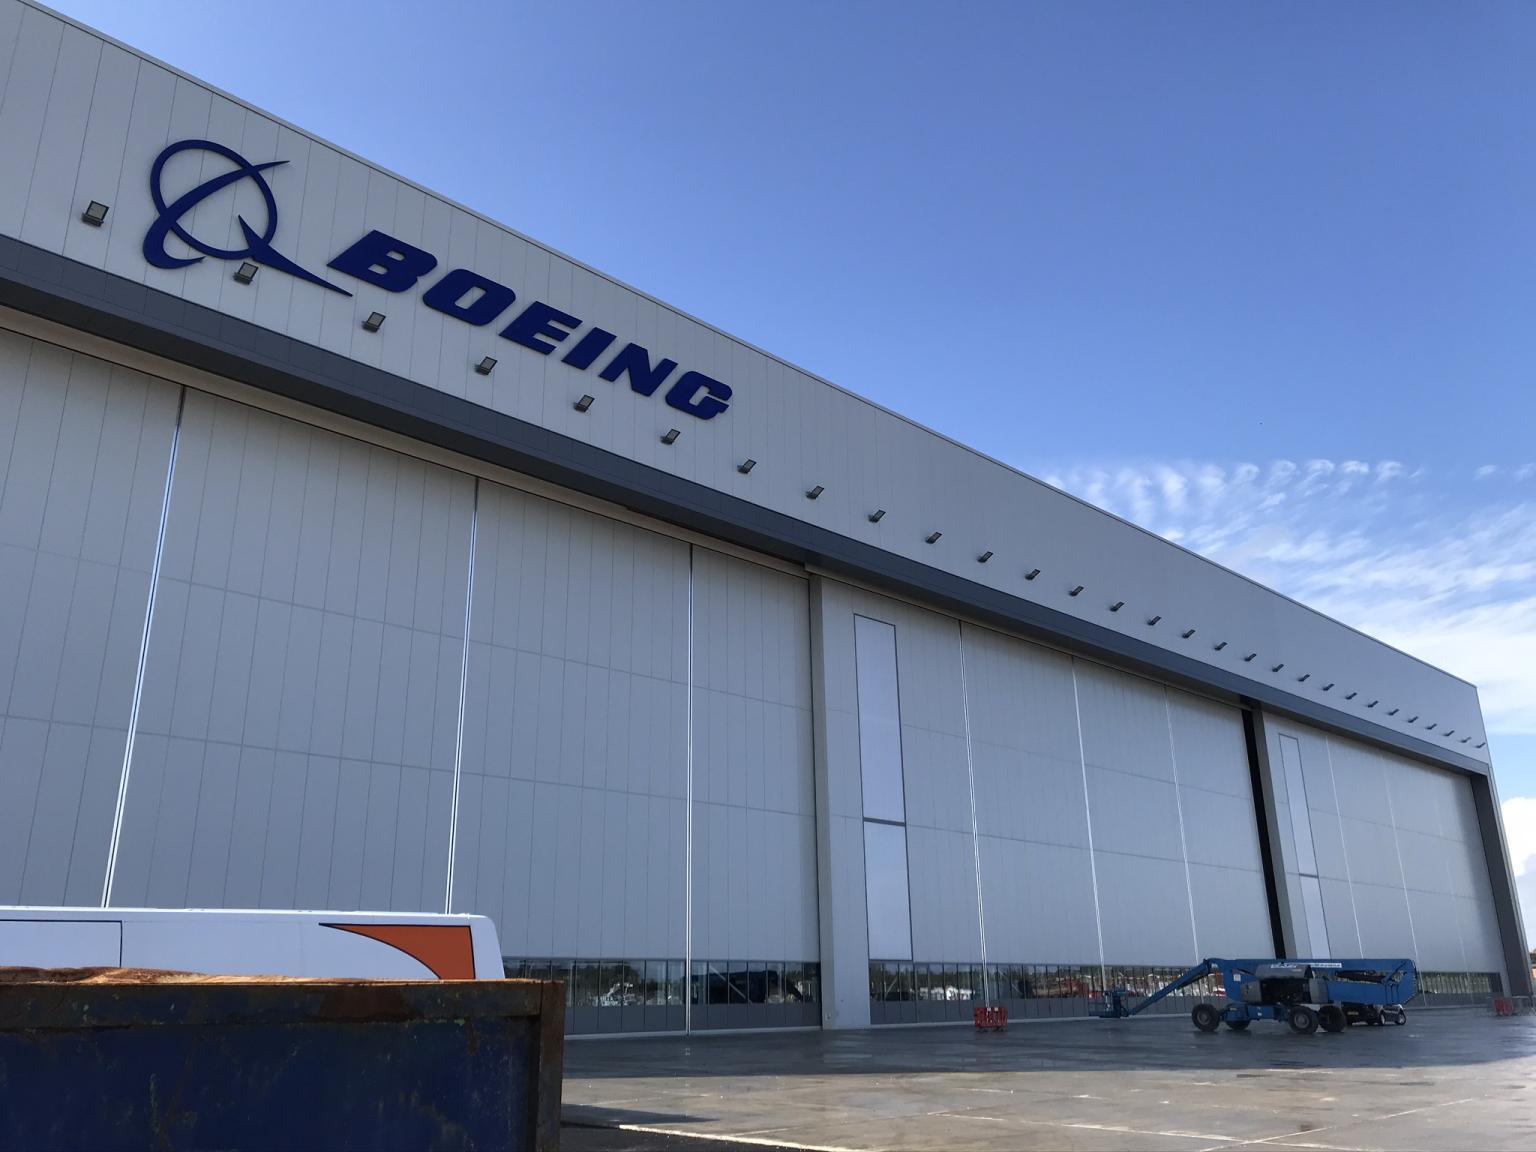 Boeing Goldcare Hangar at Gatwick Airport – 1 set of Esavian Type 126 Sliding hangar doors – The door is in three equal leaves – 2019